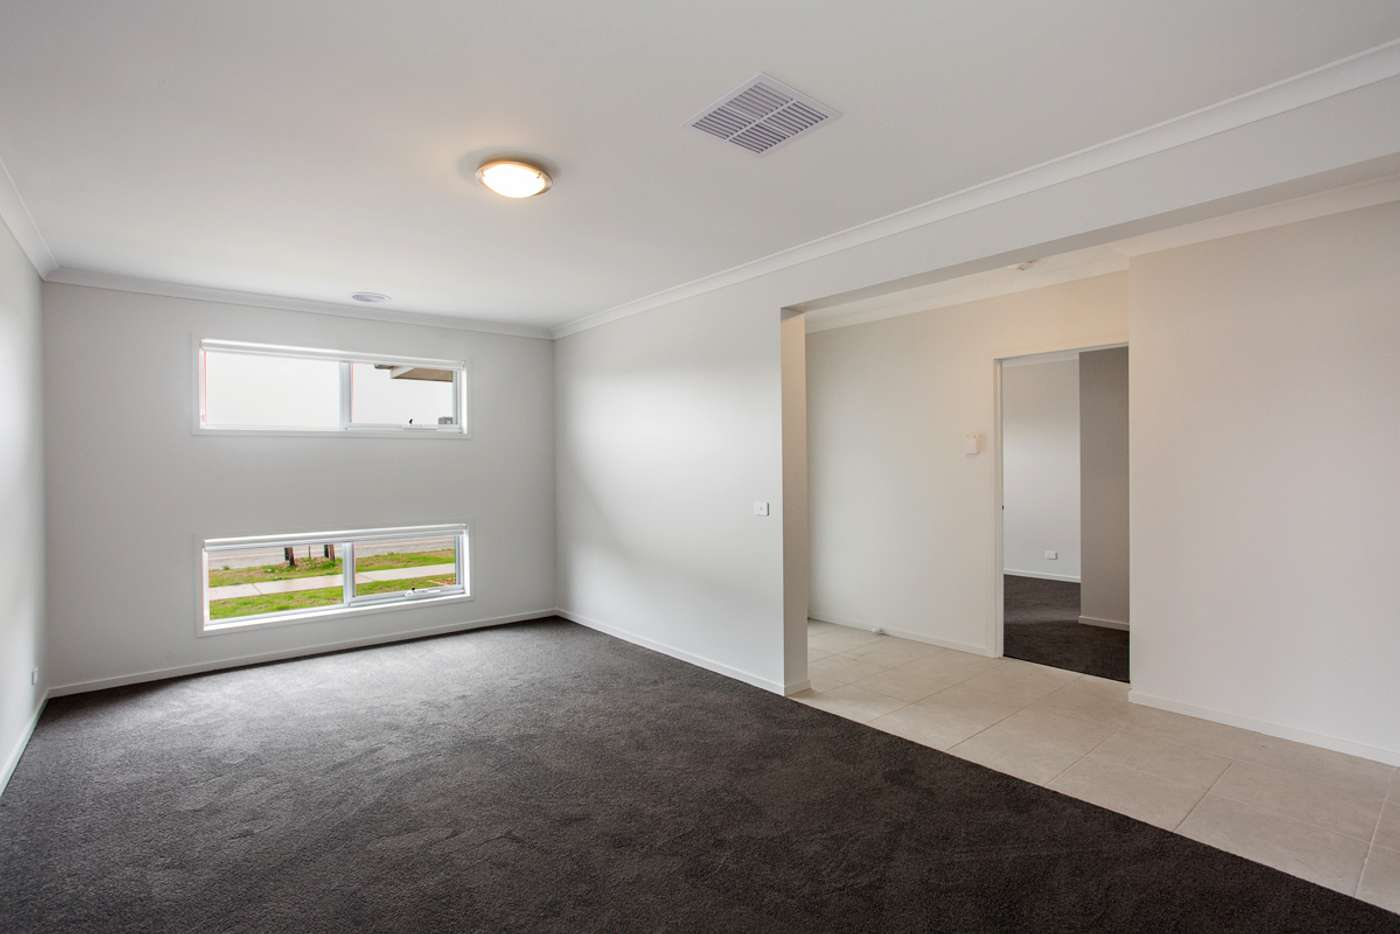 Sixth view of Homely house listing, 10 Kalamata Avenue, Alfredton VIC 3350